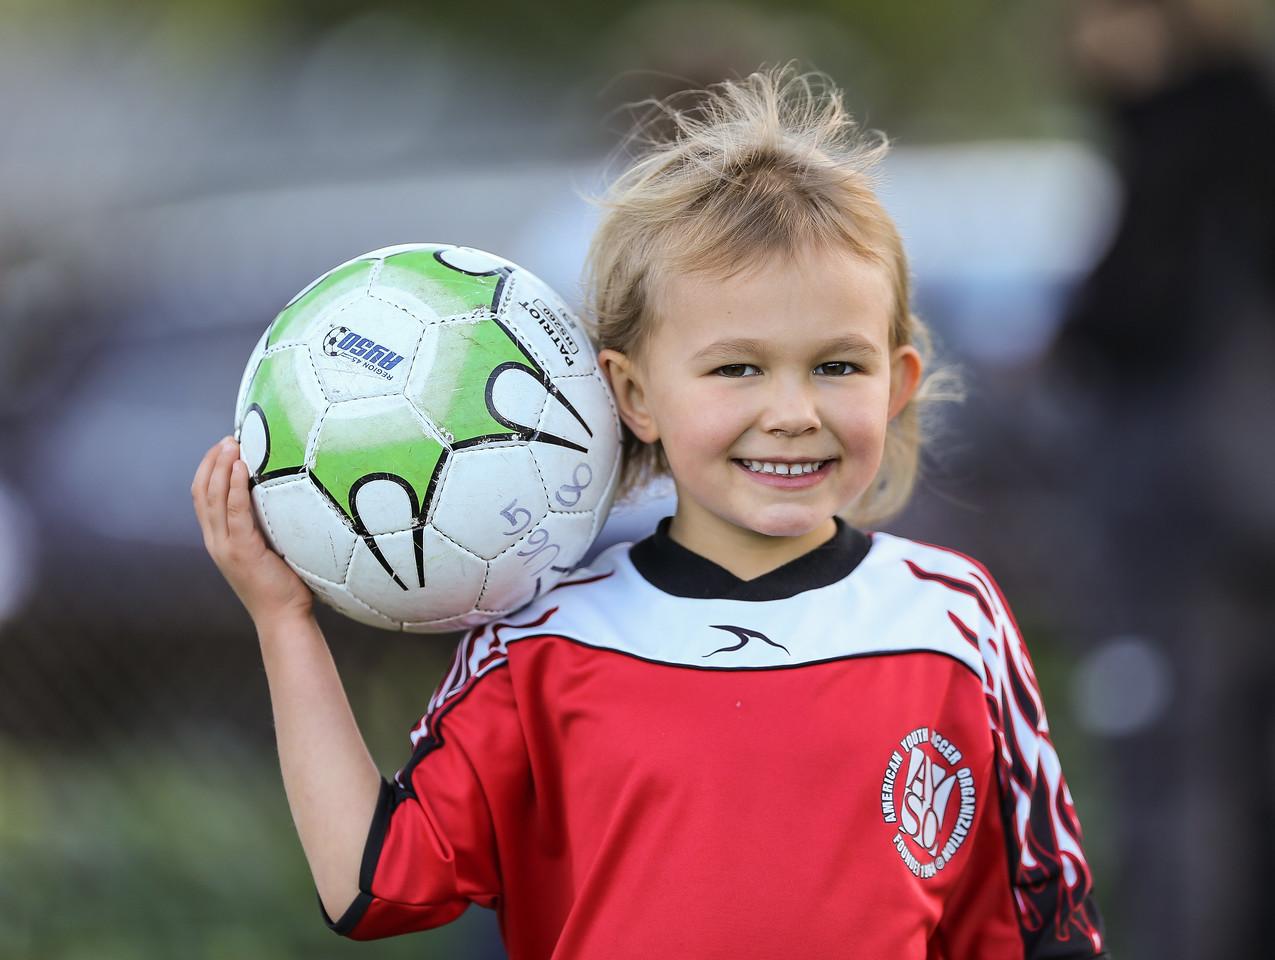 Audrey Soccer